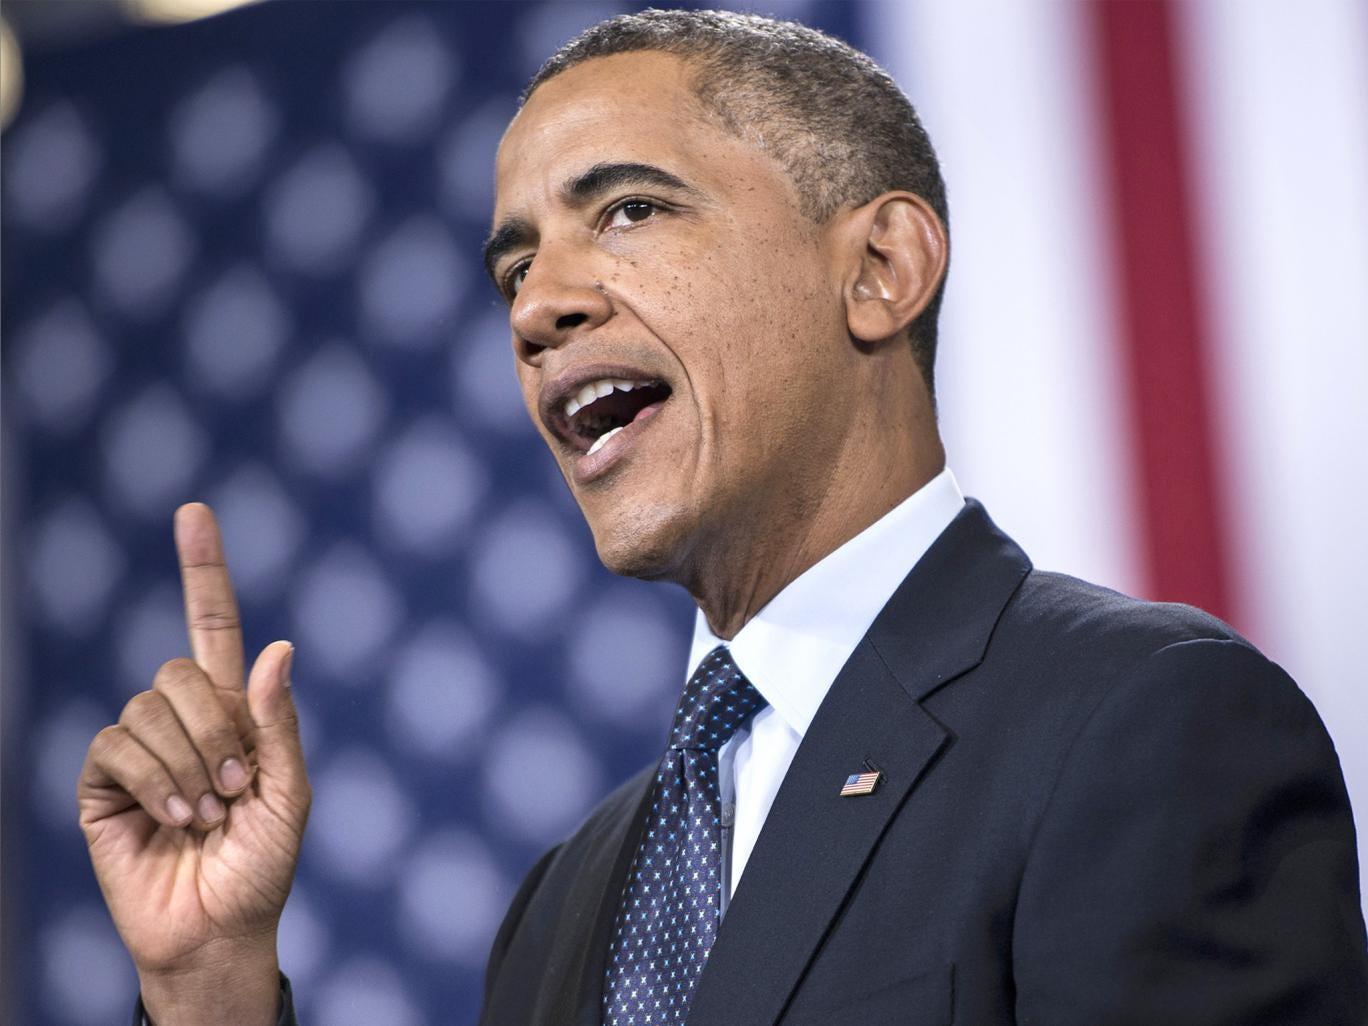 US President Barack Obama speaking in Galesburg, Illinois, on Wednesday